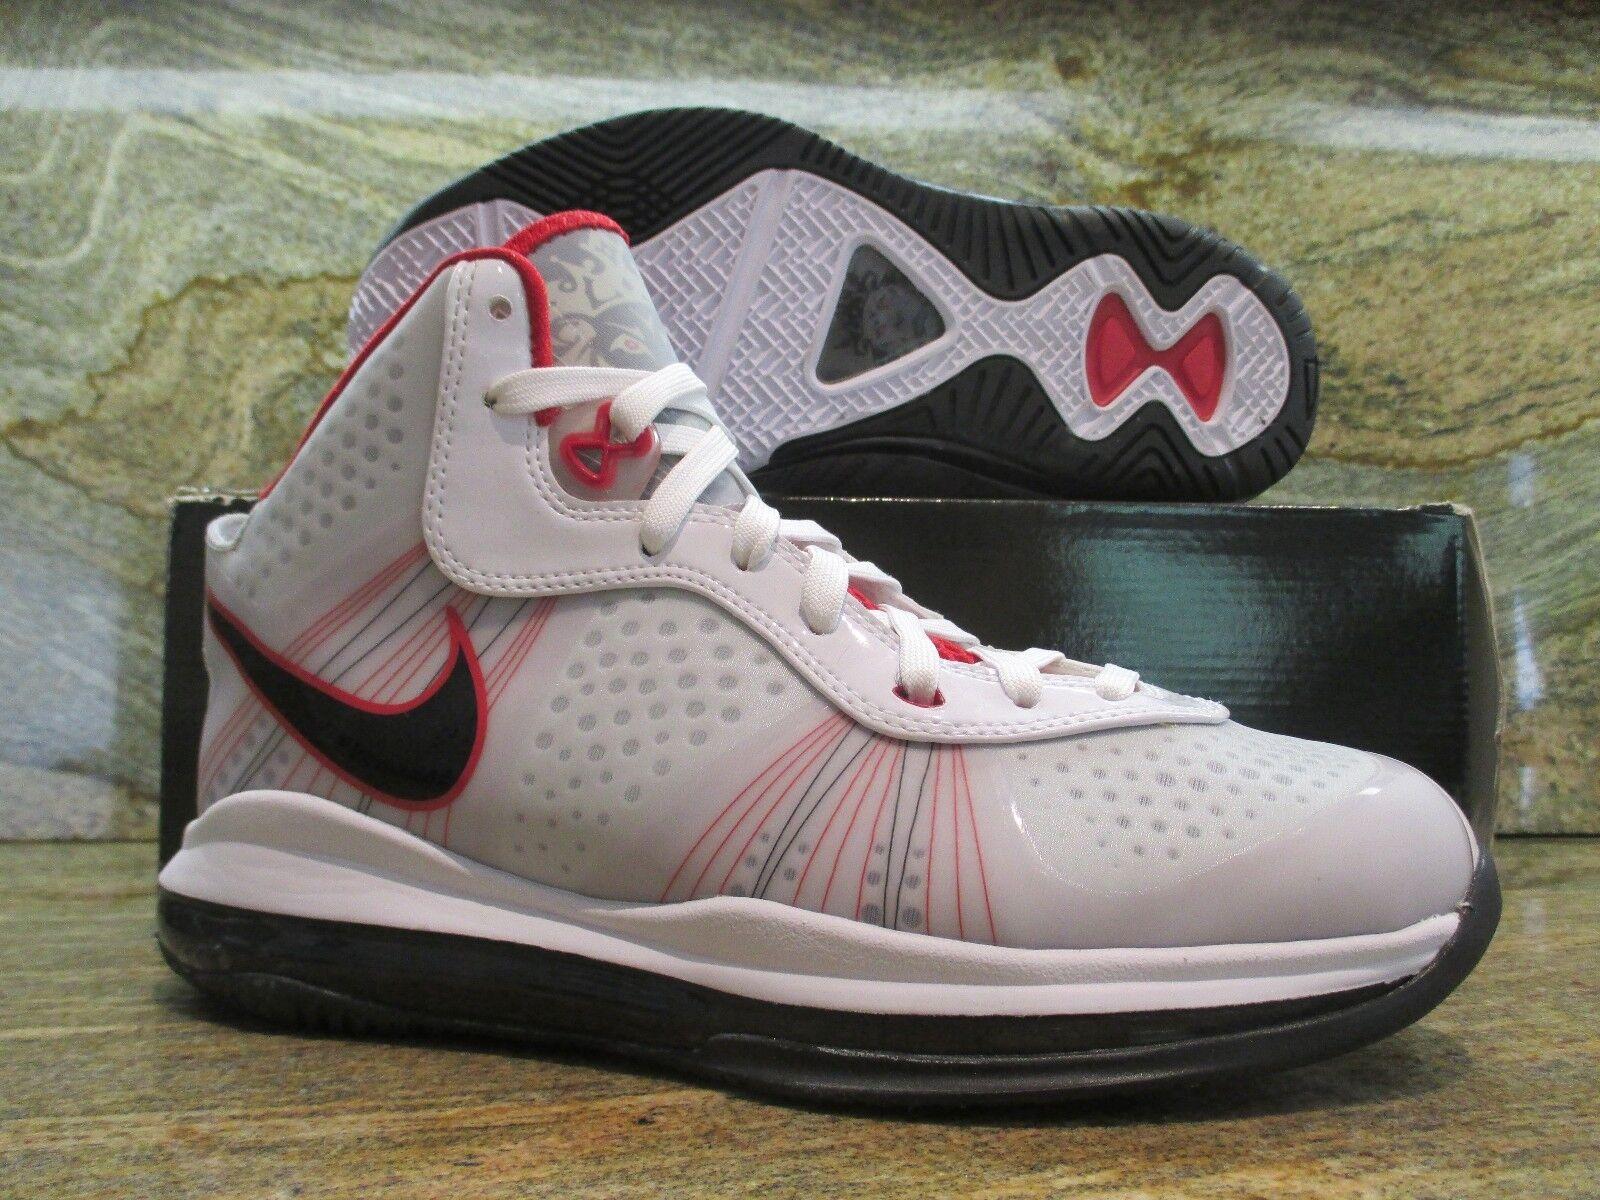 Nike Lebron James 8 V/2 SZ 8 White Black Sport Red Miami Heat Elite 429676-100